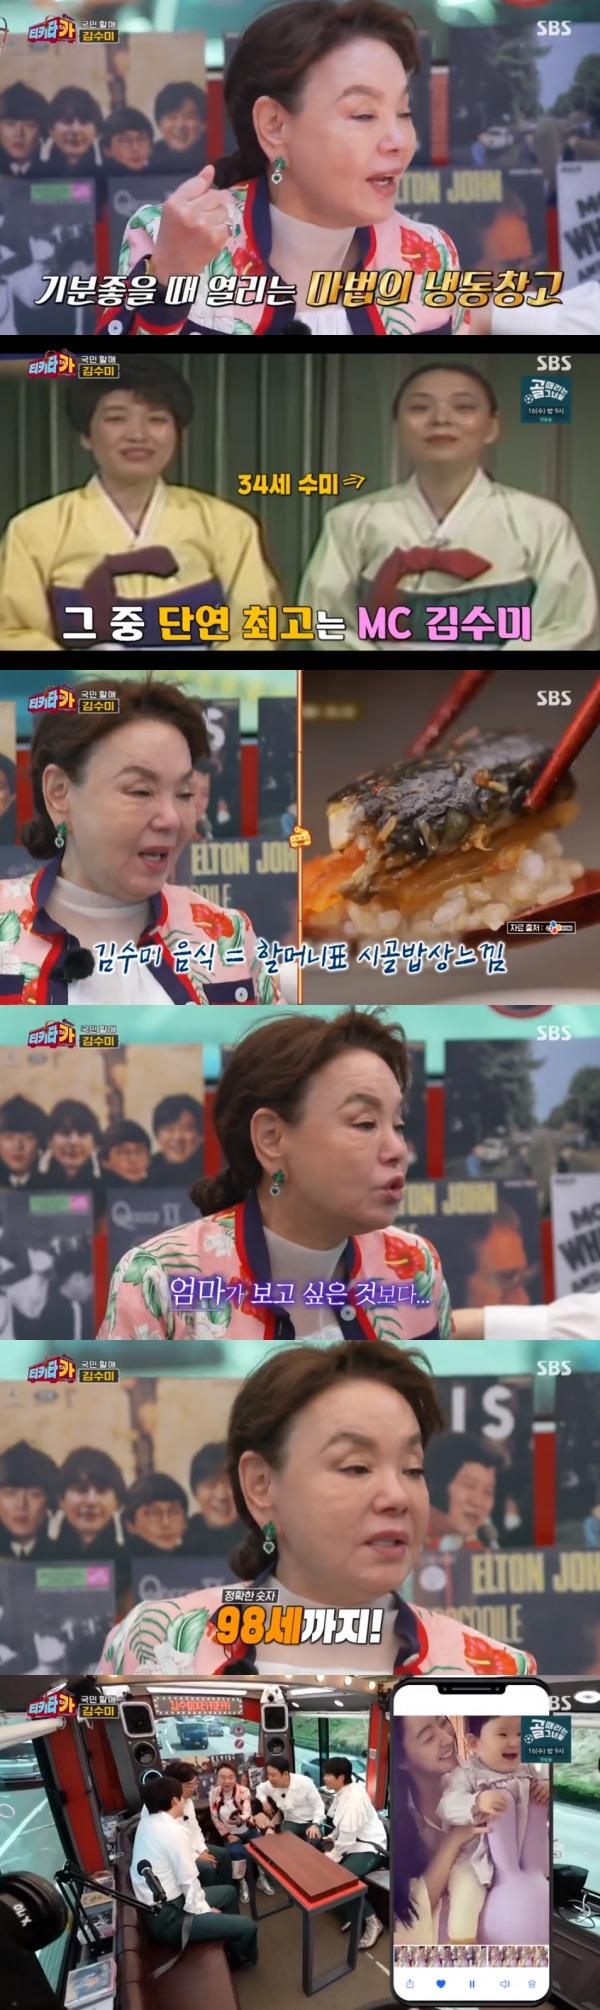 SBS '티키타카' 방송 화면 캡처 © 뉴스1